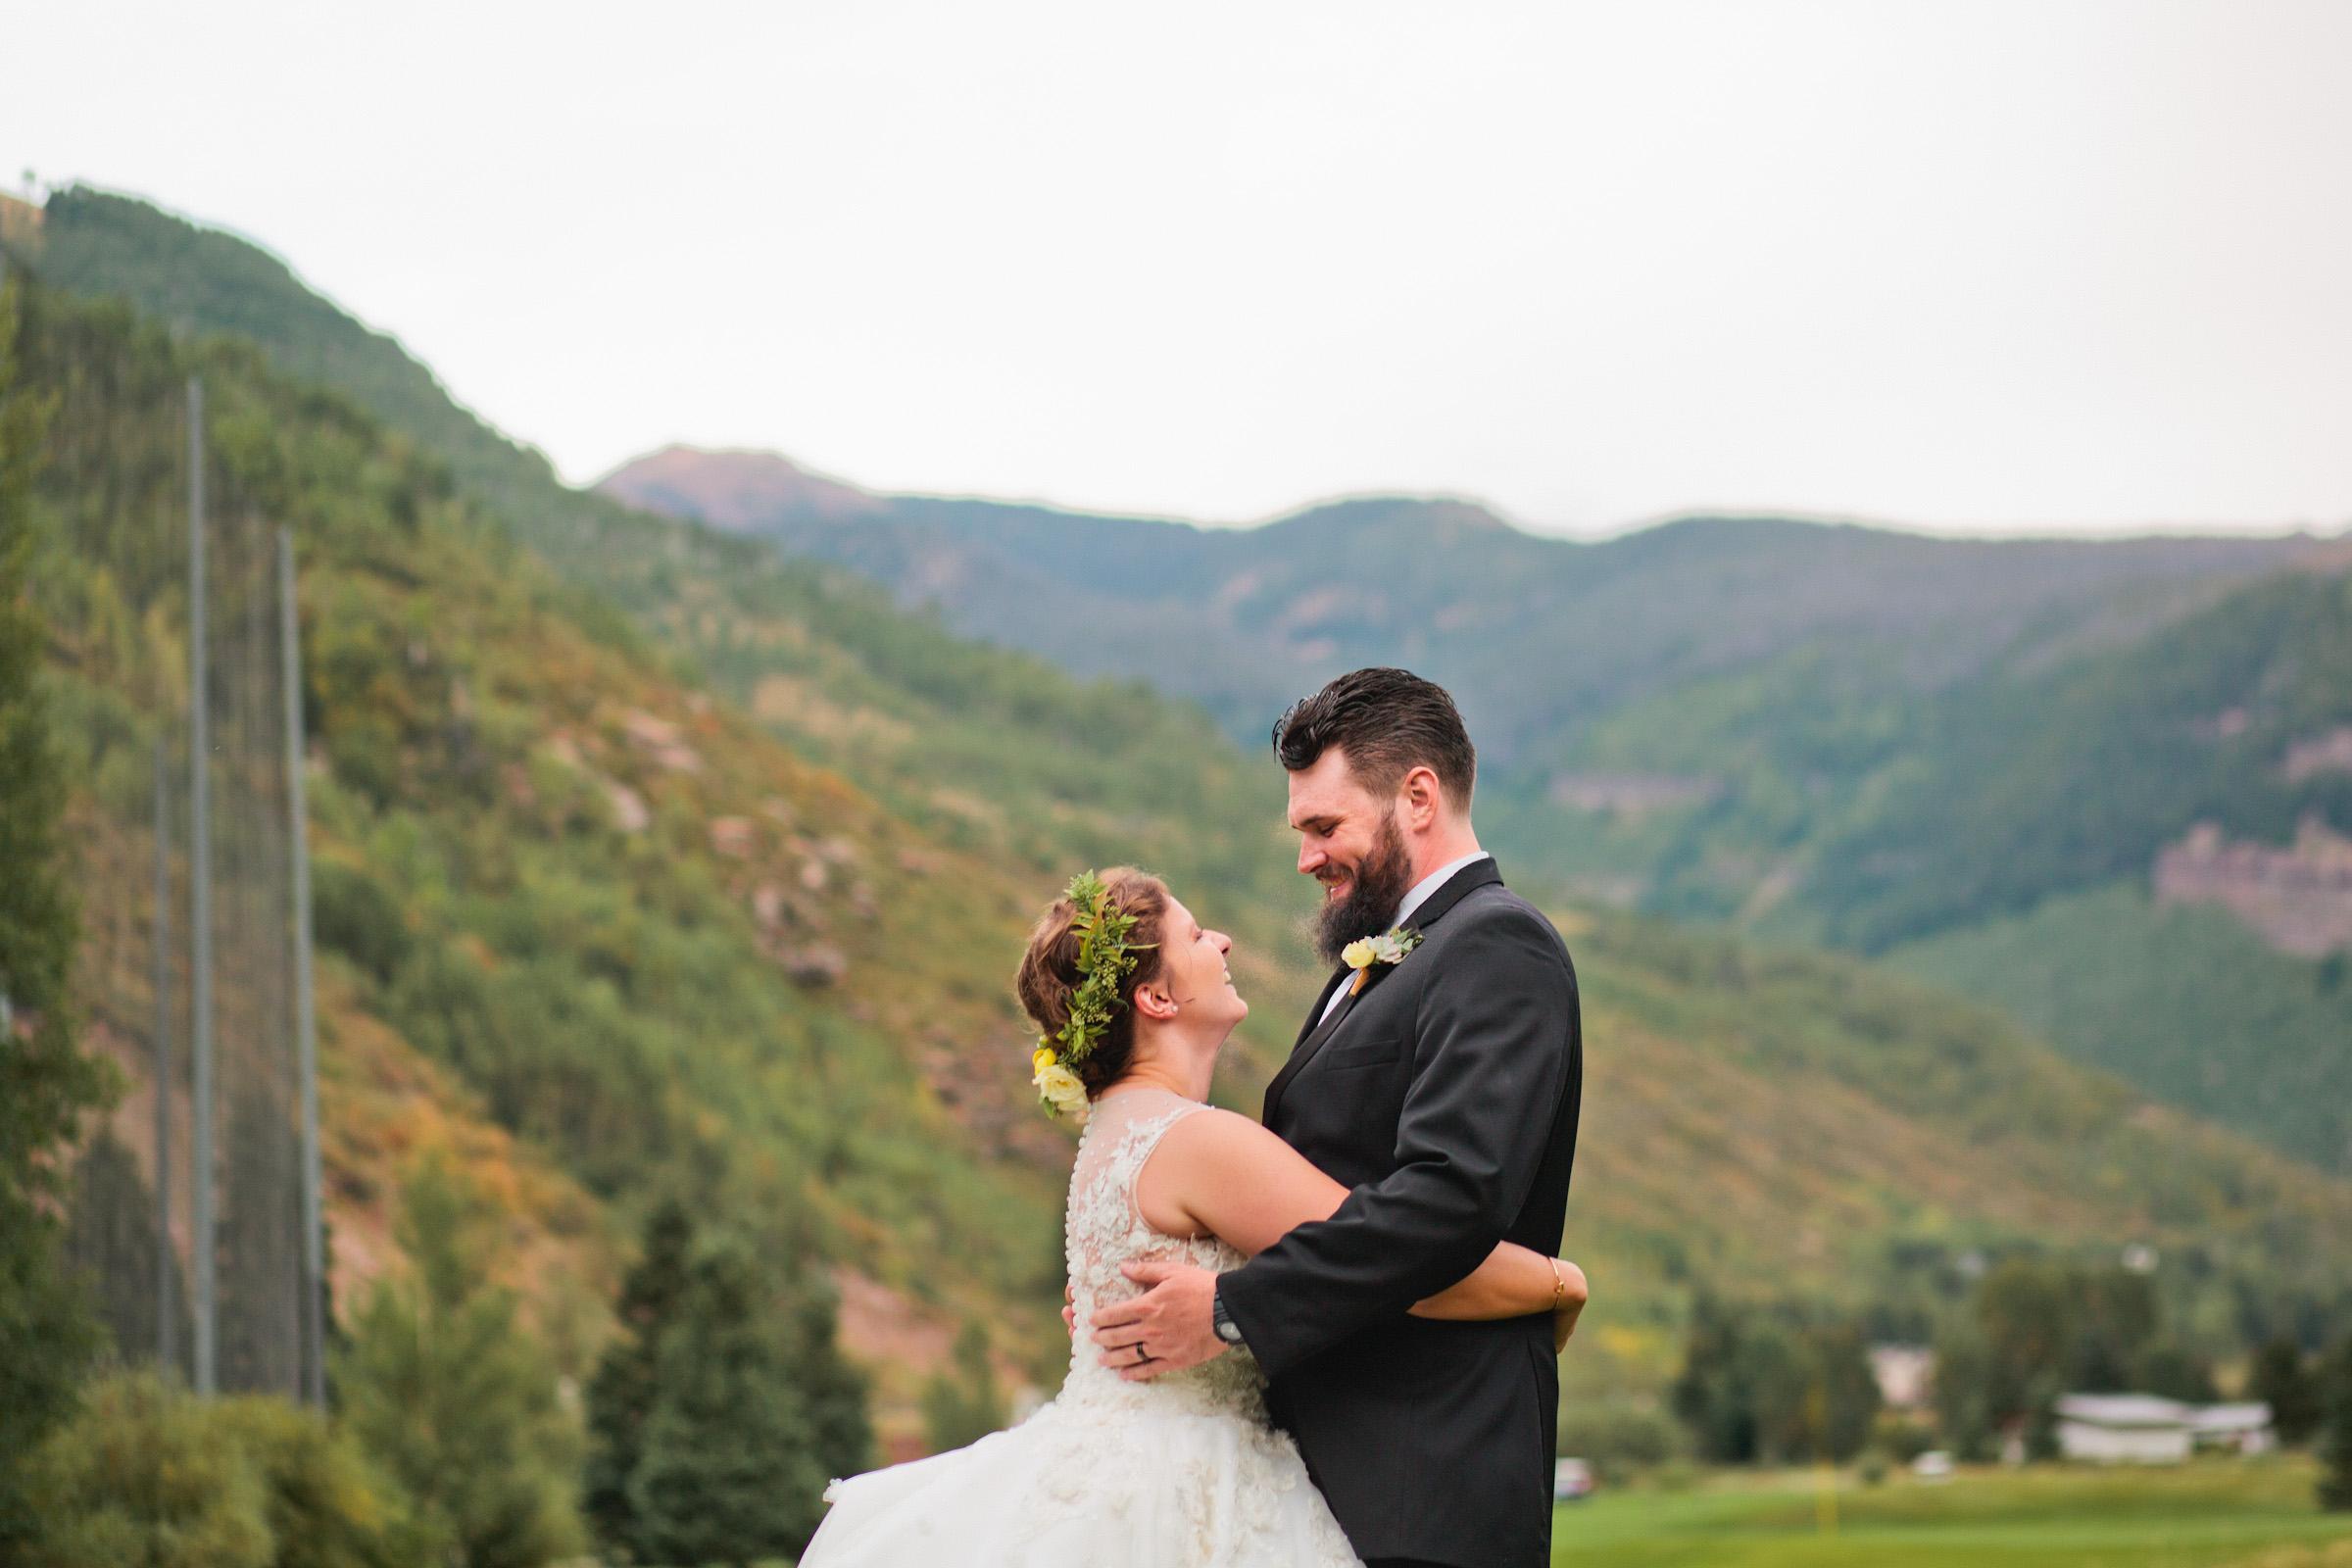 Vail Colorado wedding photographers Amelia Renee